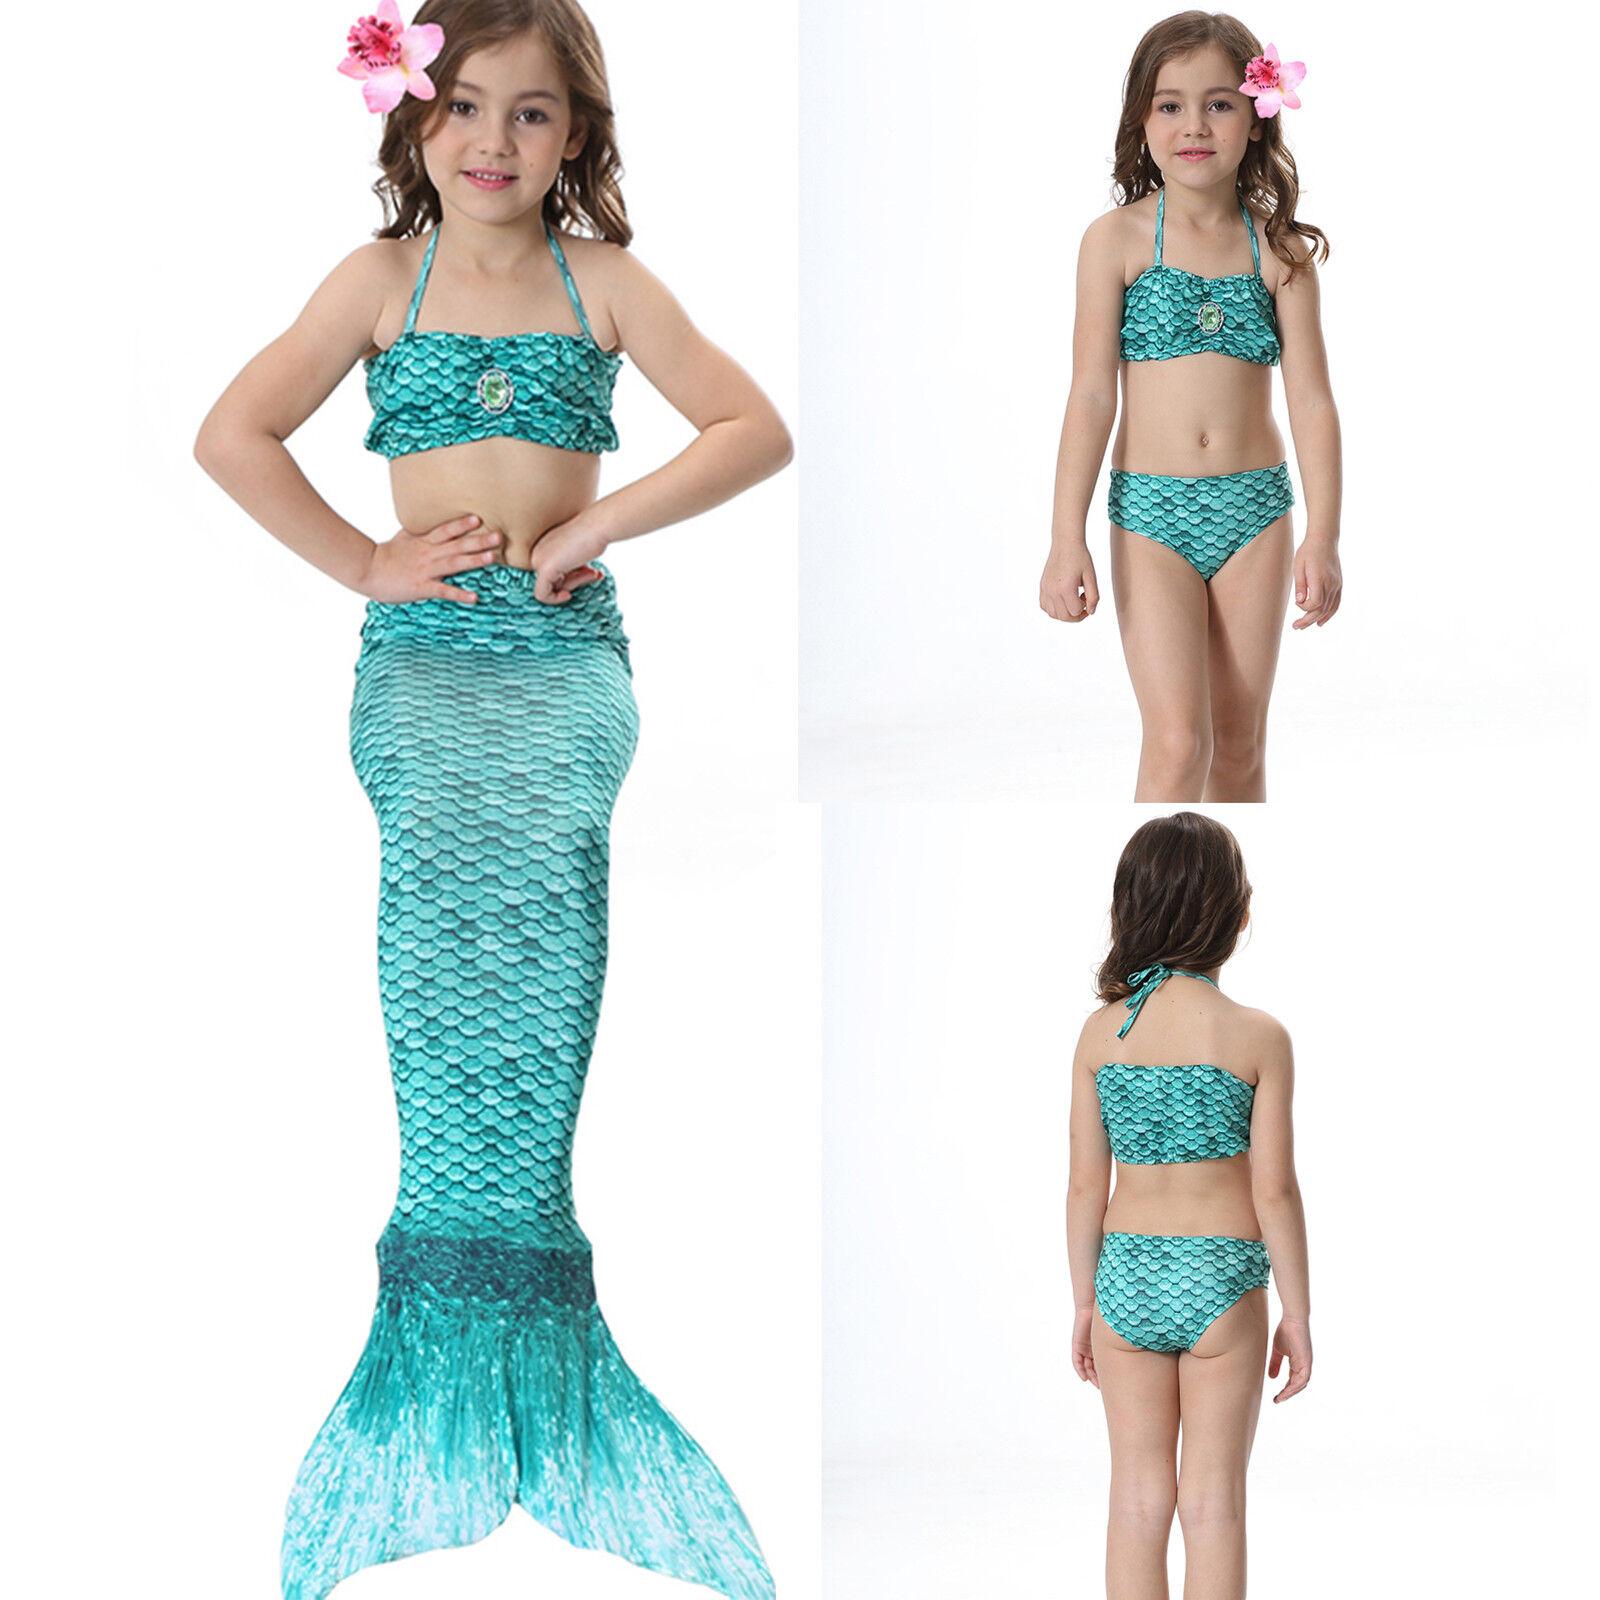 Kinder Meerjungfrau Kostüm Mädchen Bademode Badeanzug Cosplay Sommer Bikini Set